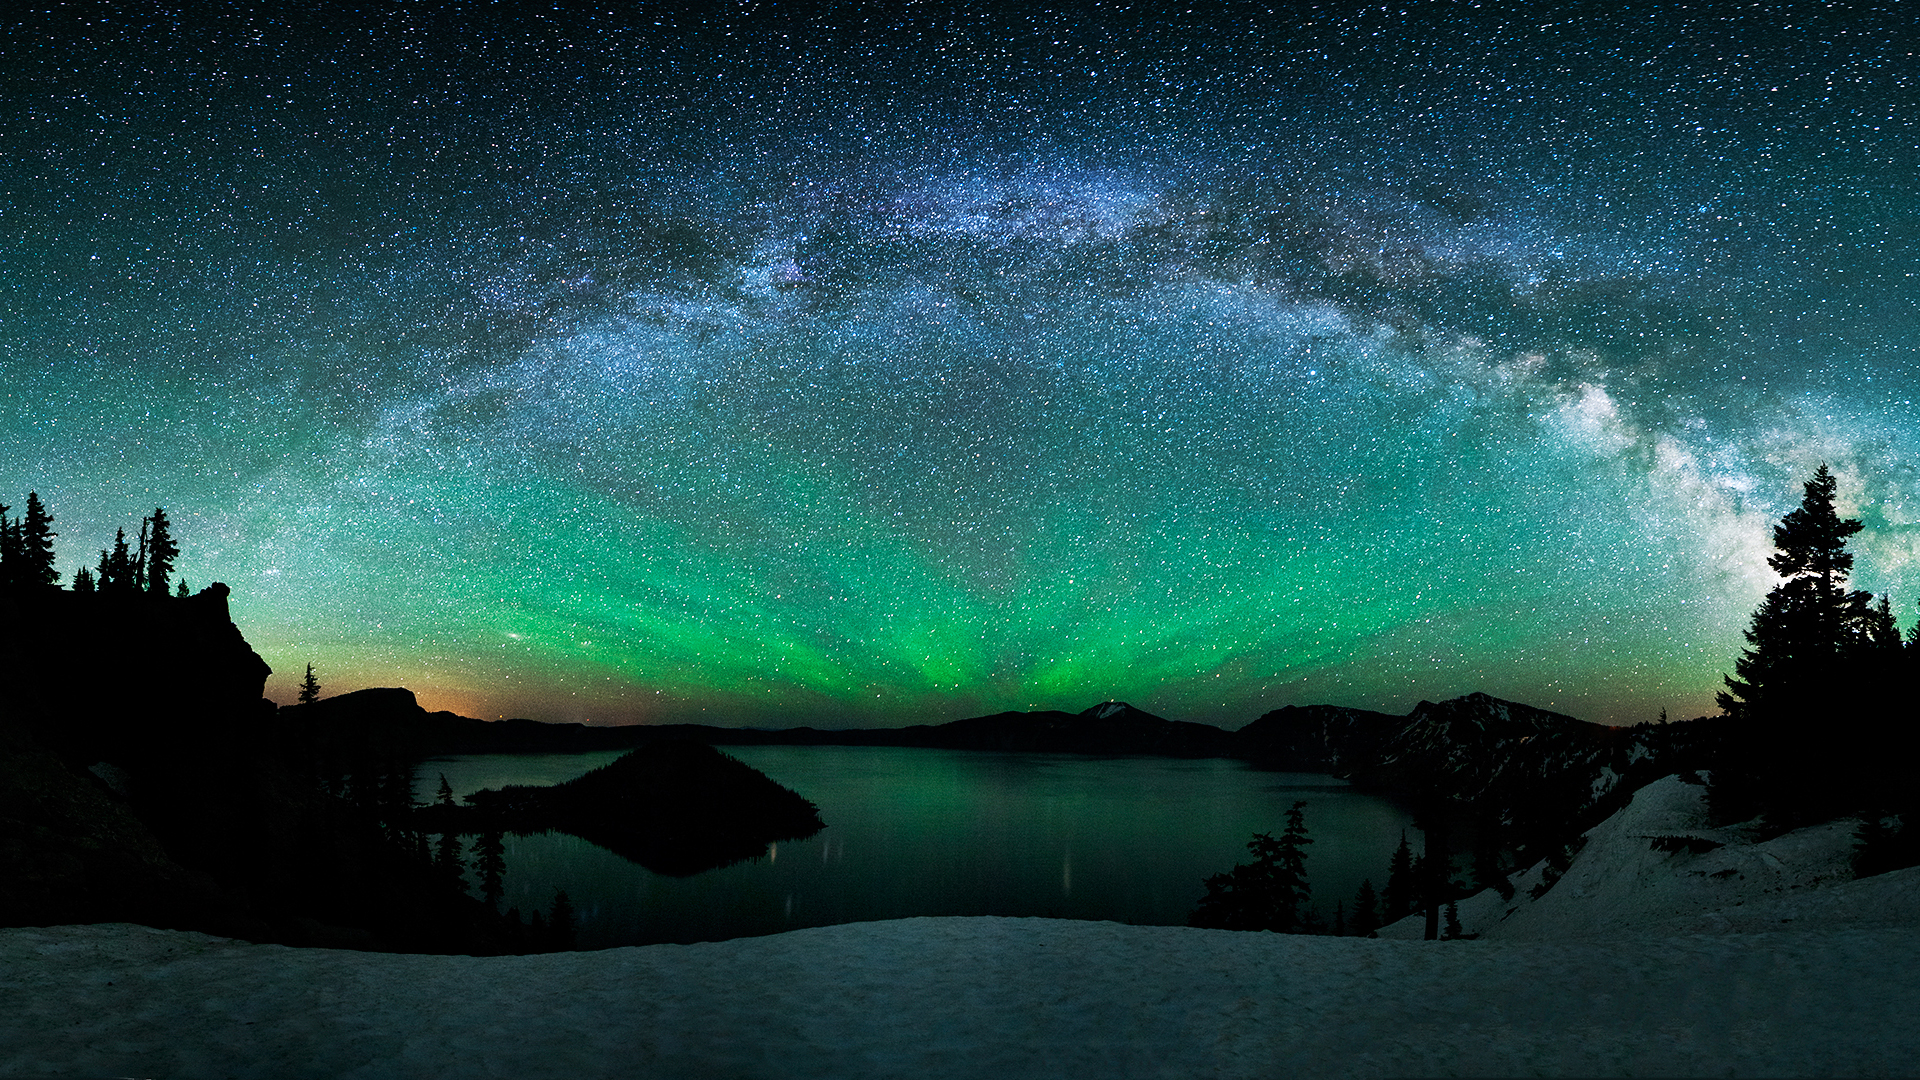 stars winter snow Northern Lights aurora borealis wallpaper background 1920x1080